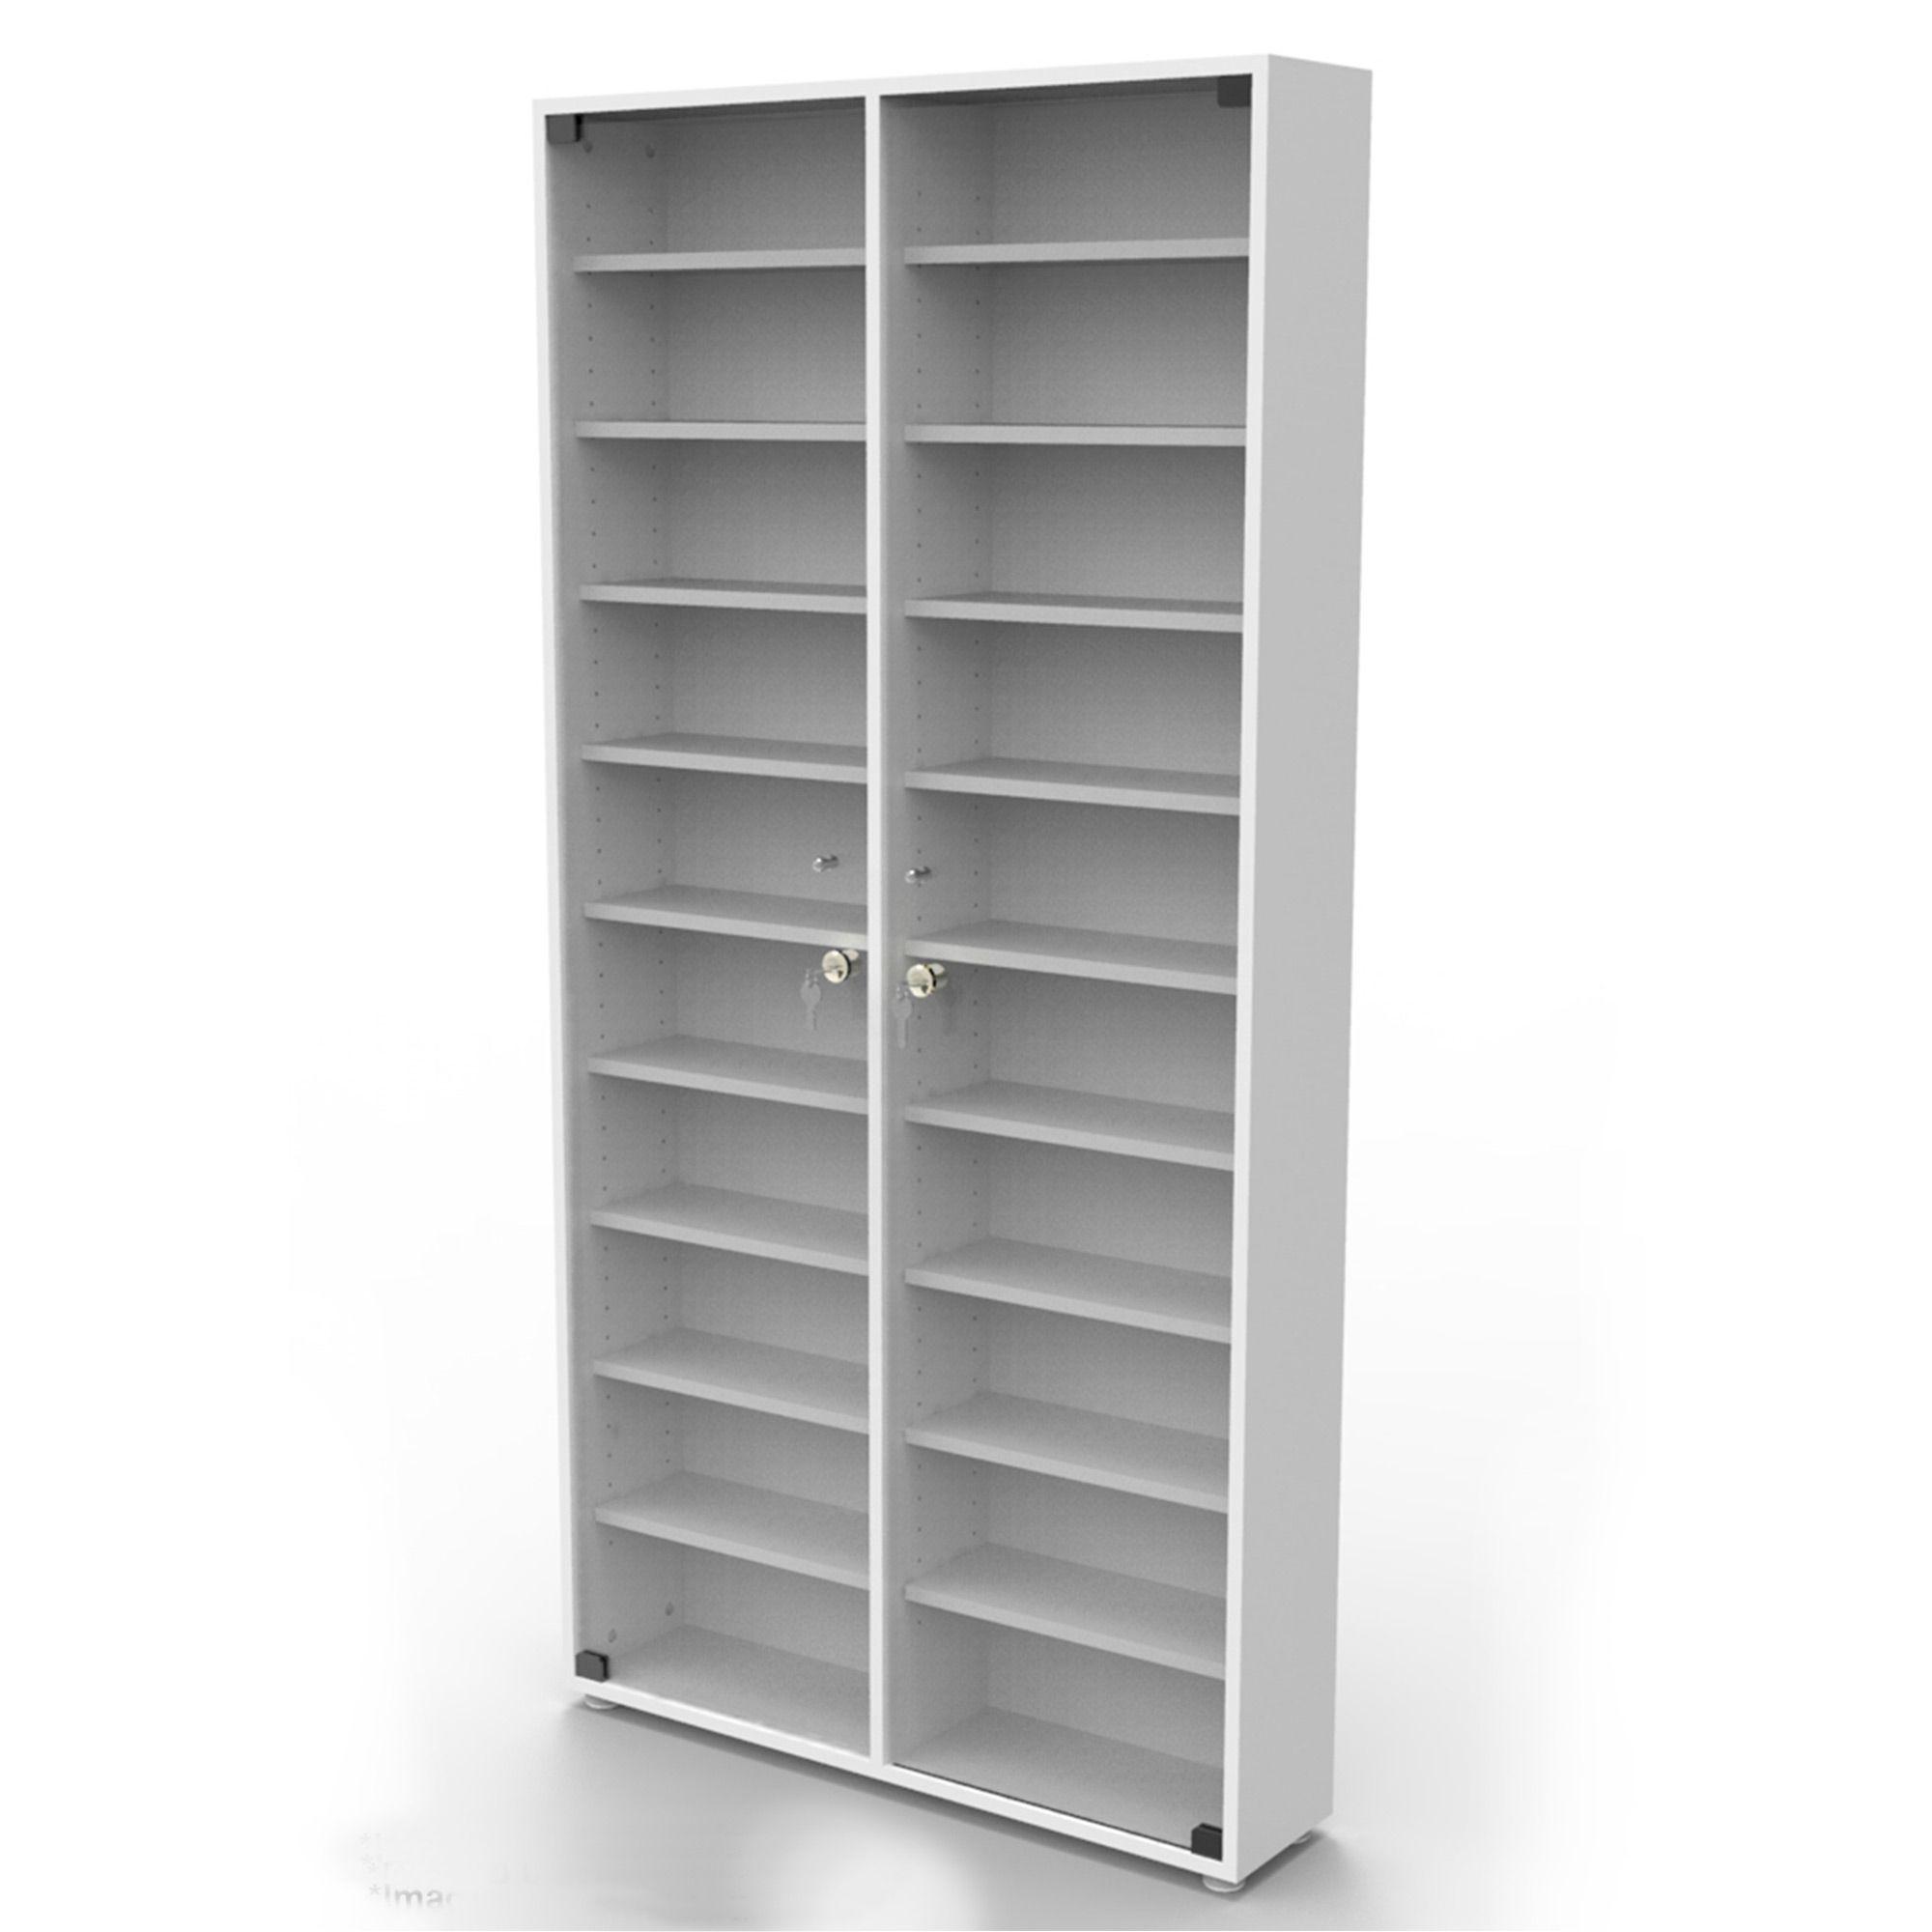 Estante 740 CDs branca + porta vidro incolor com chave CD740BRIC Bürohaus